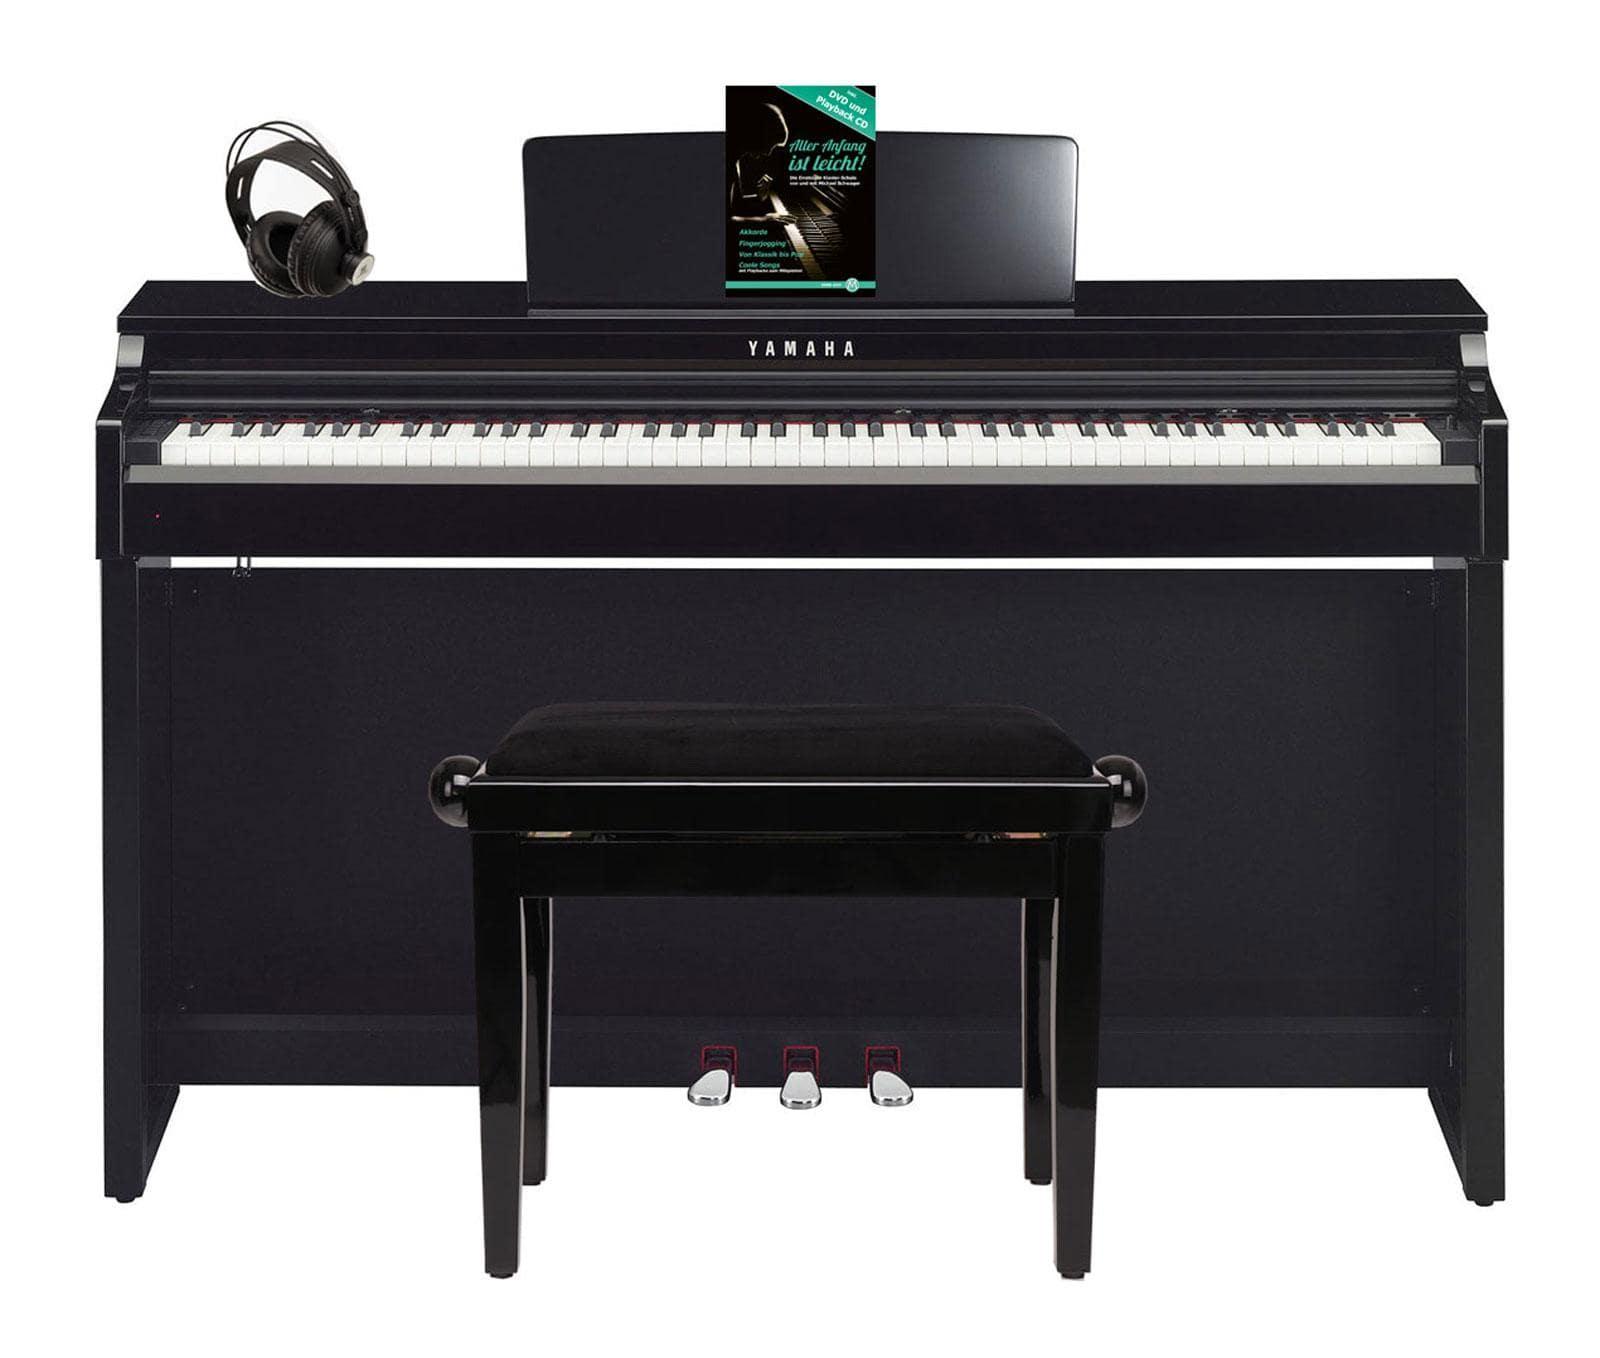 Yamaha CLP 625 PE Digitalpiano schwarz hochgl. SET mit Kopfhörer, Bank, Schule